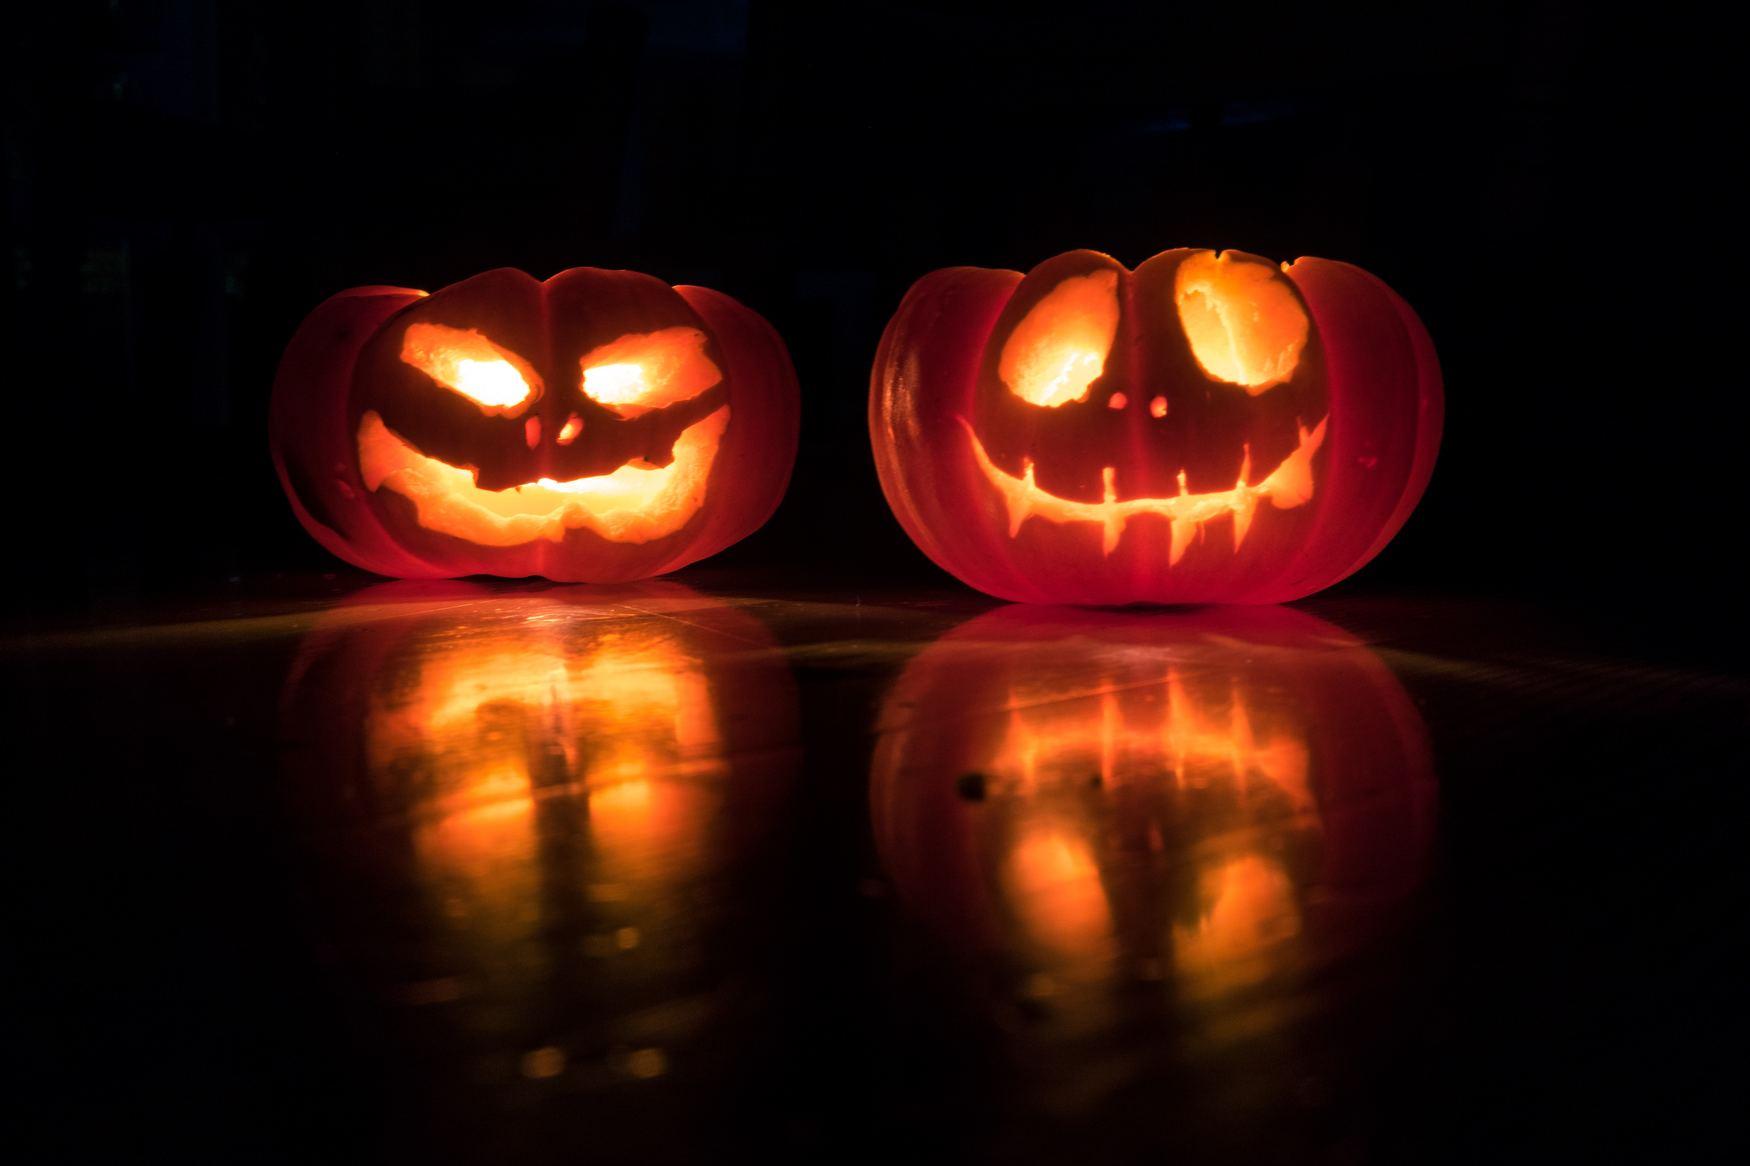 halloween, pumpkin patch, crockford bridge farm, addlestone, west byfleet, weybridge, surrey, family, half-term